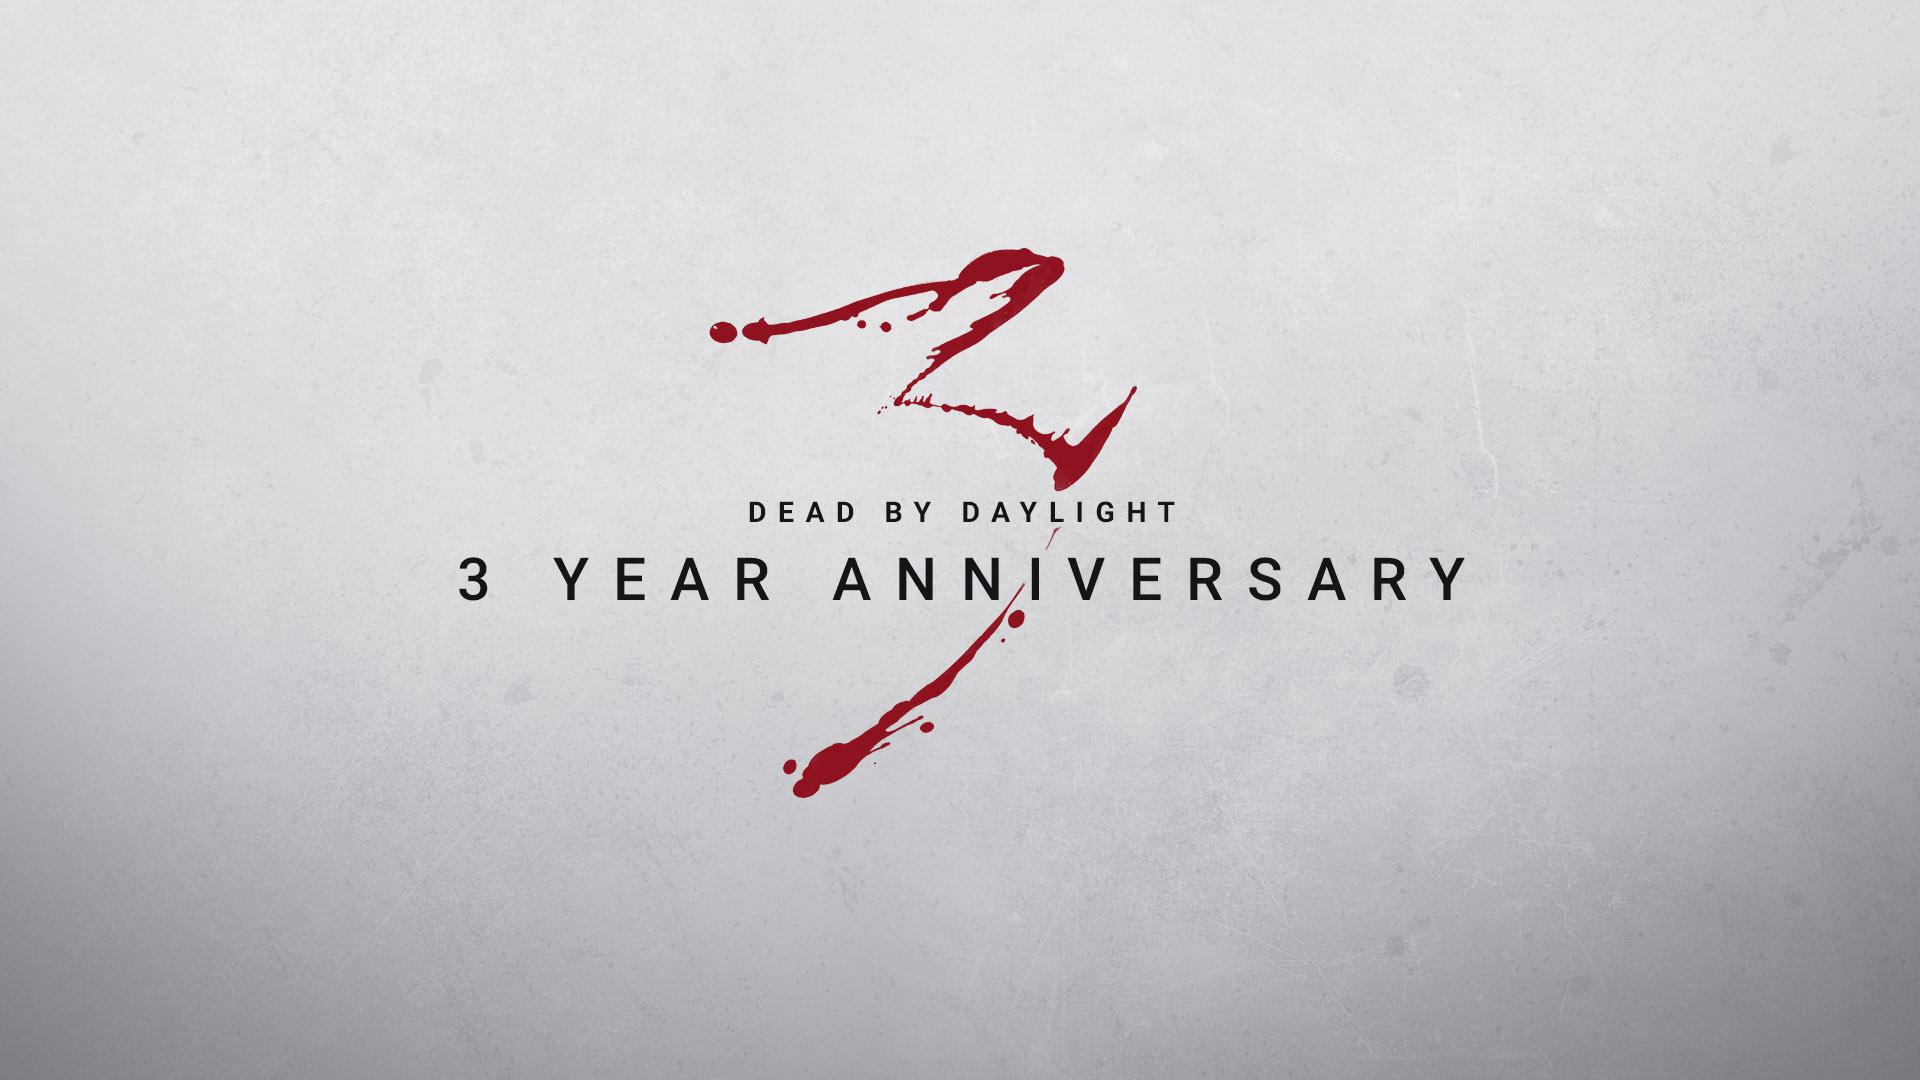 Dbd_Anniversary_000_Logo_Background.jpg